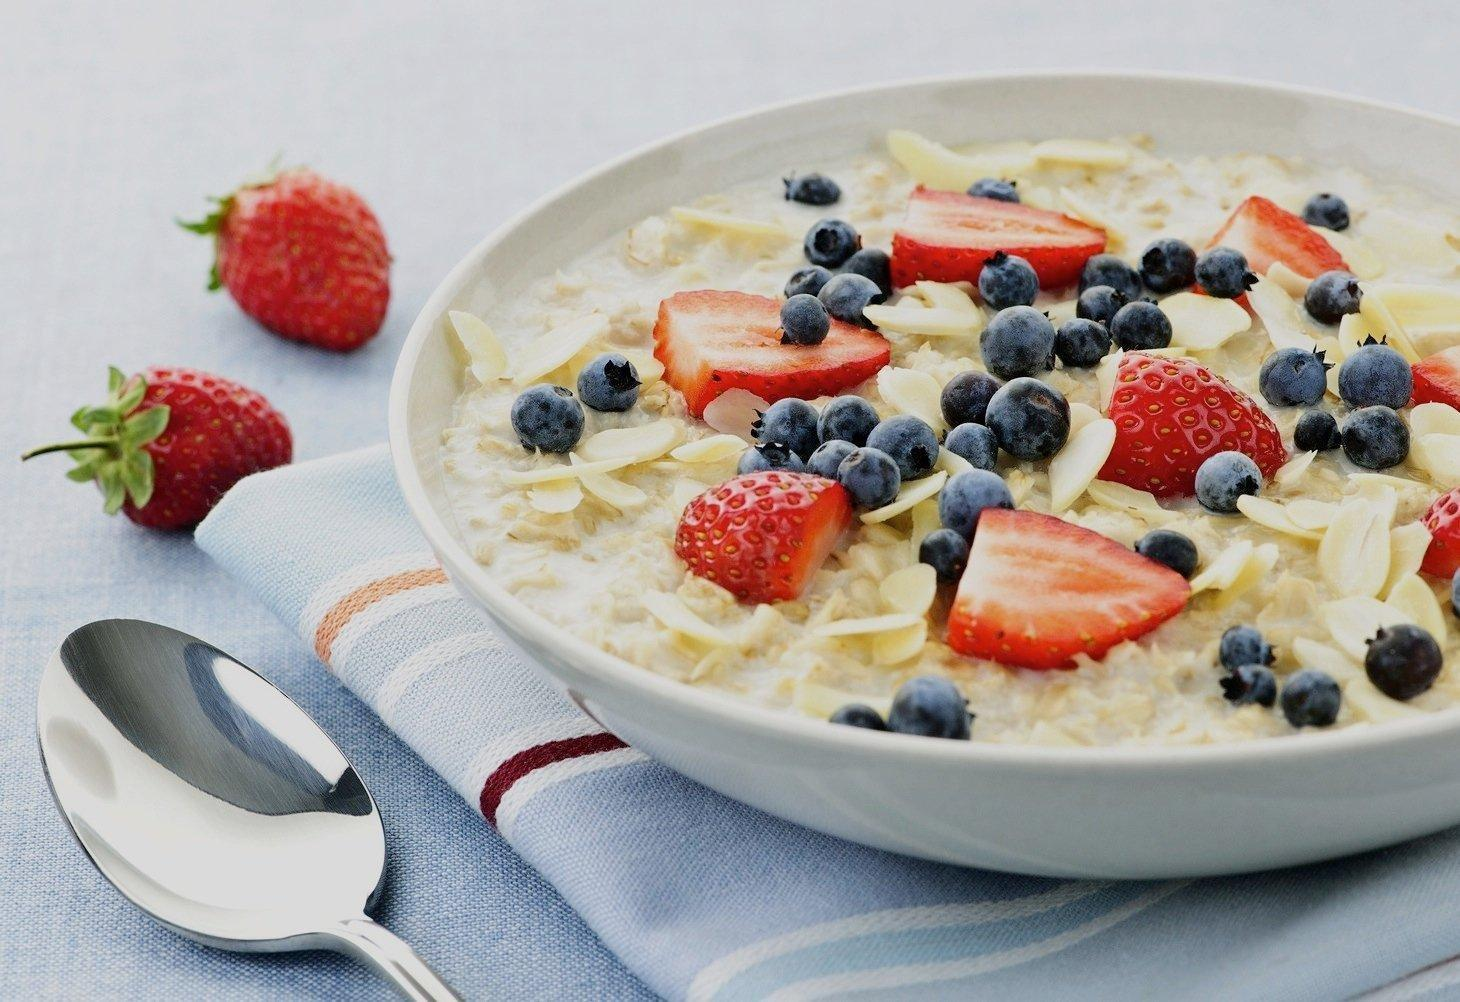 Plant Based Diet Recipes For Diabetics